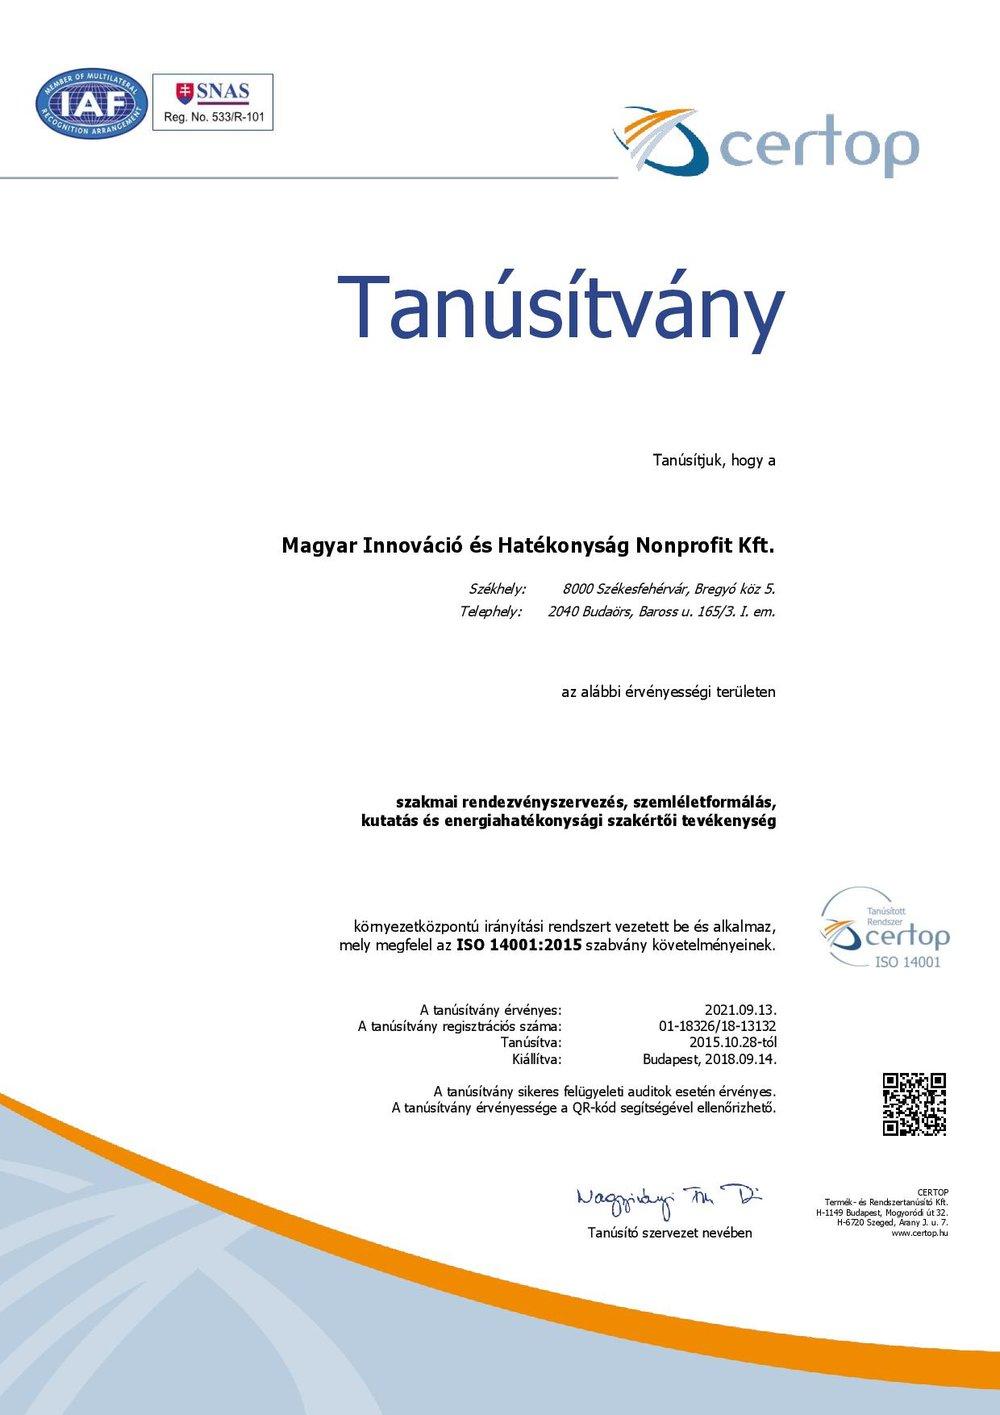 tanúsítvány HU18326-18 ISO 14001-2015 magyar-page-001.jpg